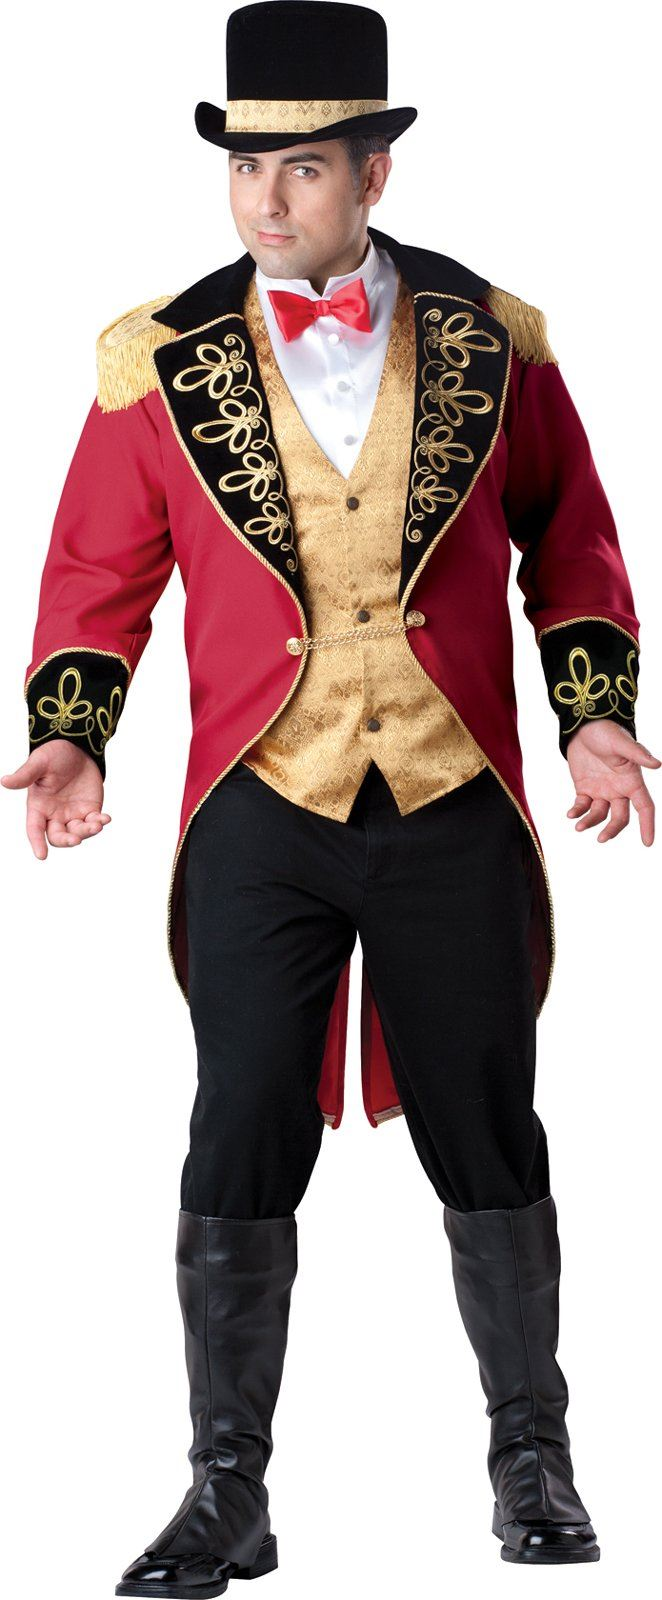 Plus Deluxe Men Ring Master Halloween Costume 16199 The